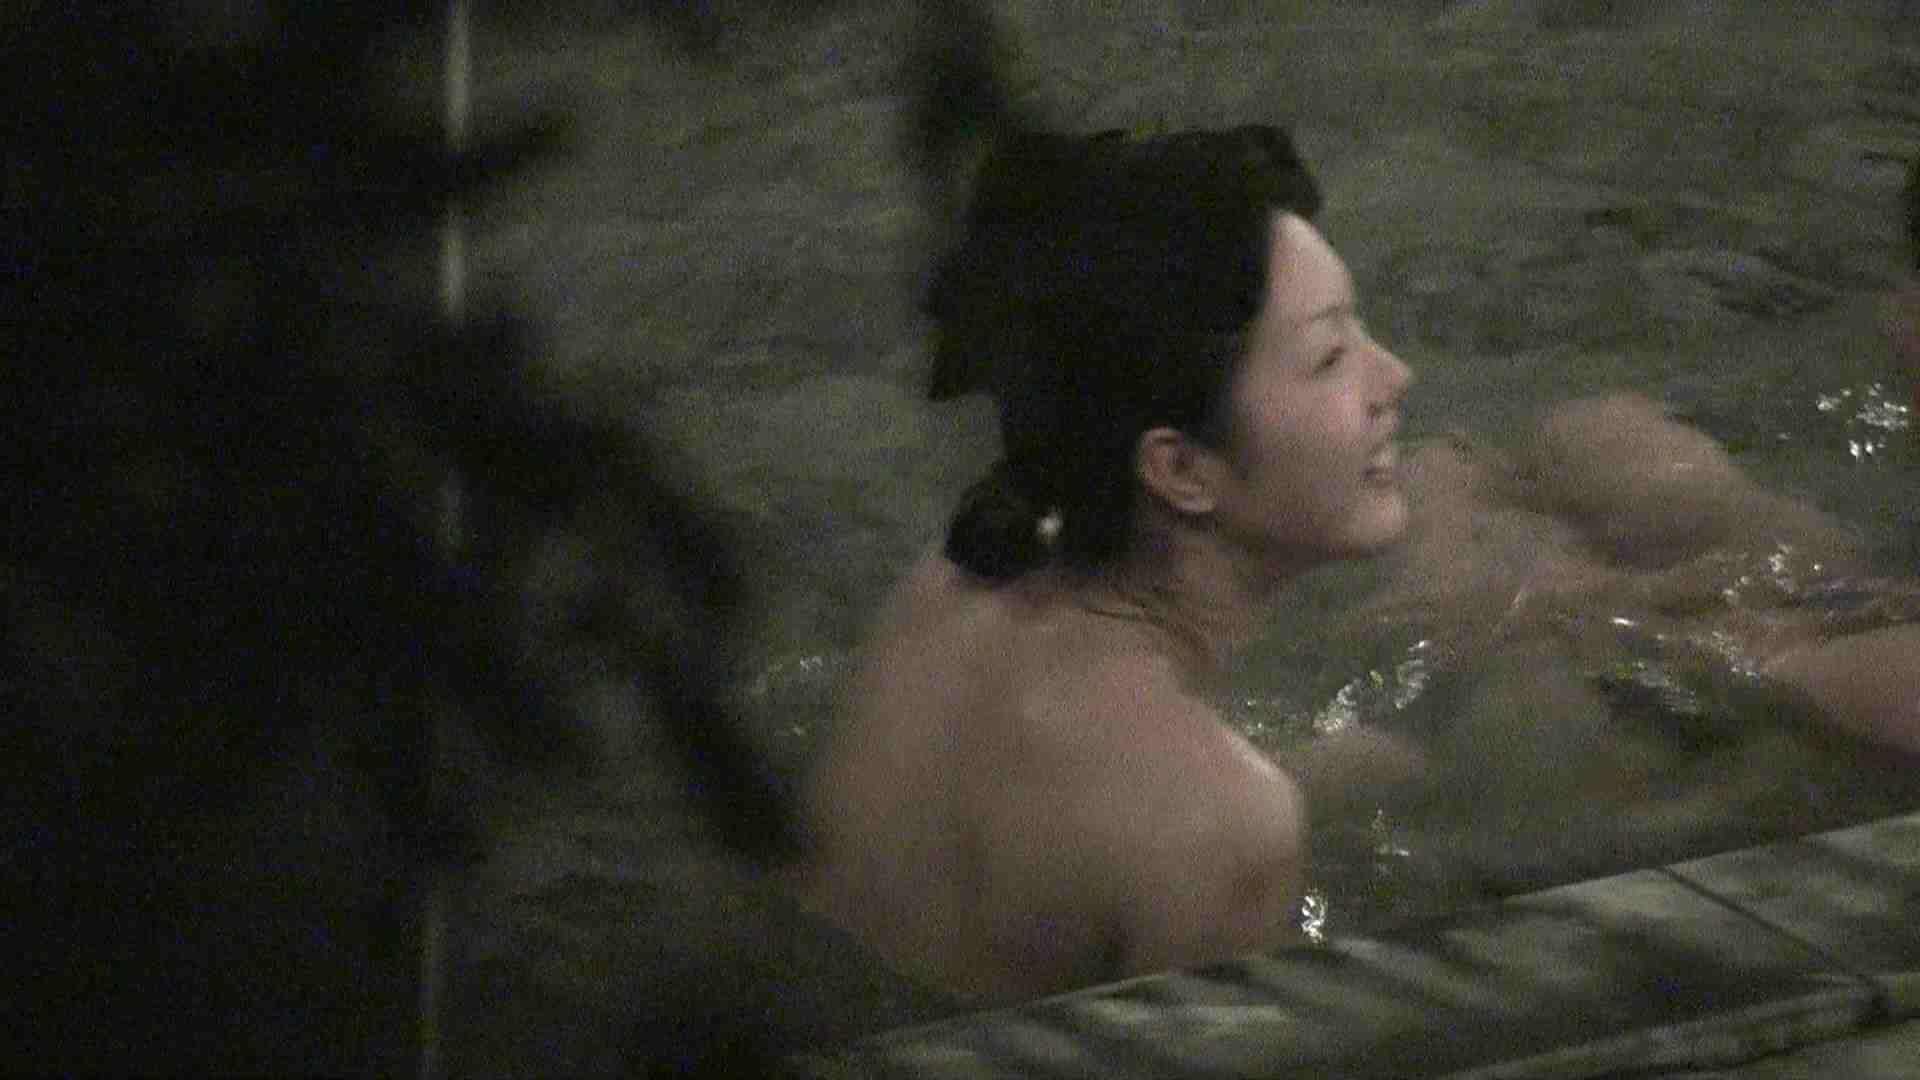 Aquaな露天風呂Vol.315 0  66連発 48